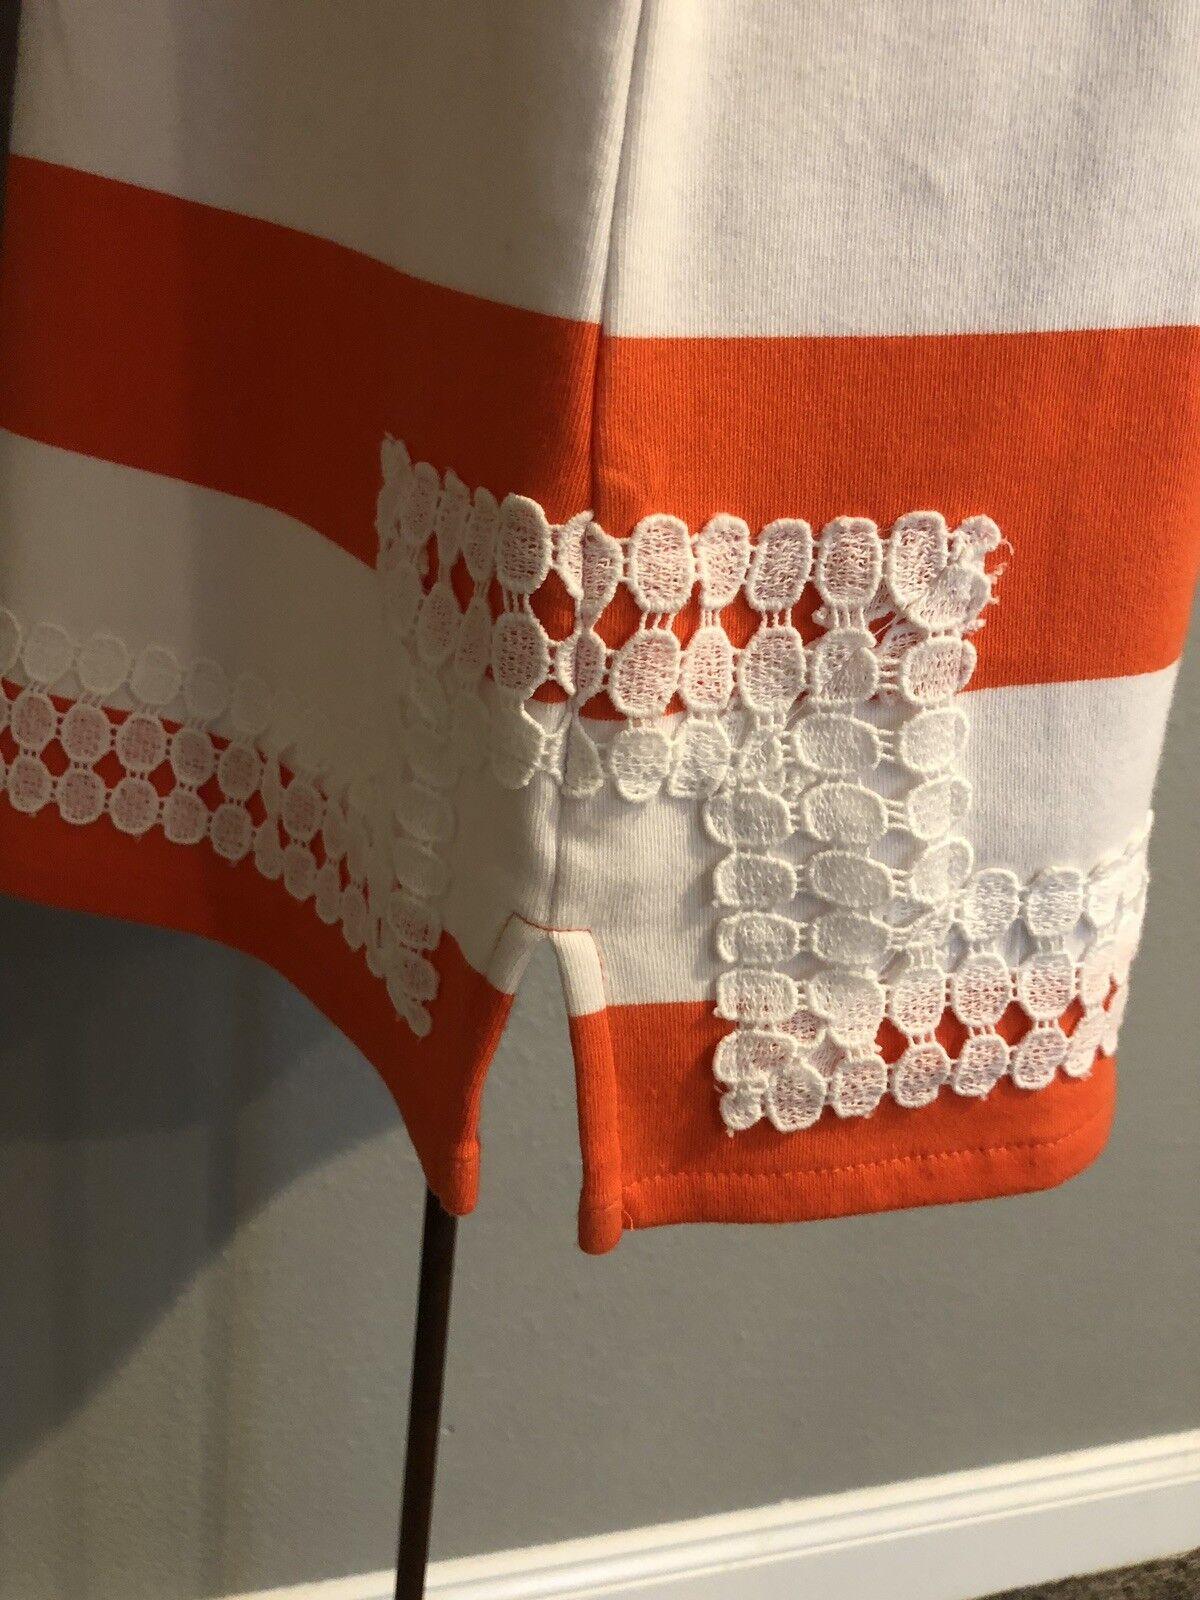 Crown & Ivy Womens Striped Striped Striped Dress orange White Size Small.  G44 9f3486